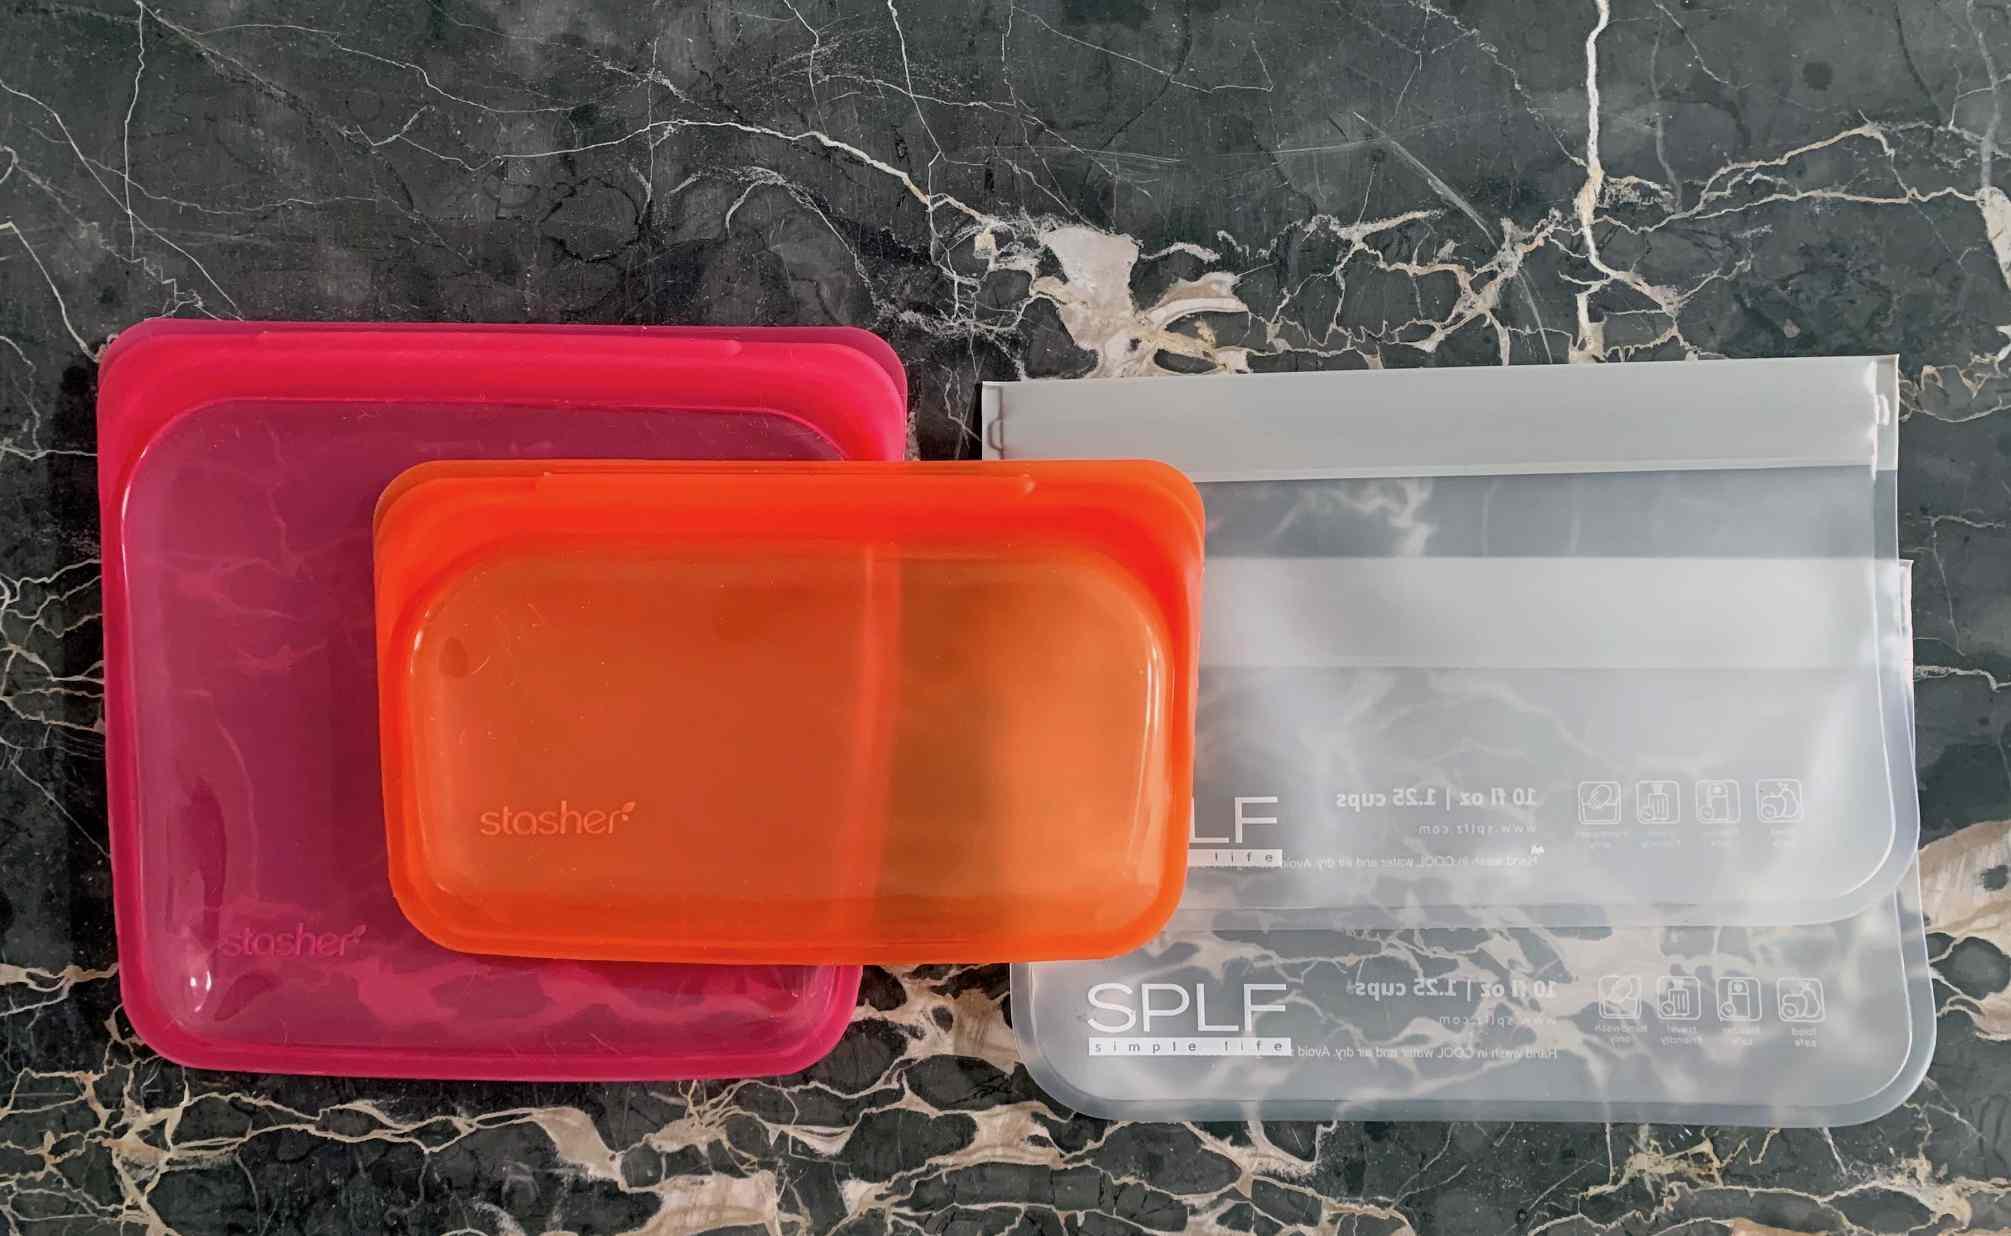 resusable zipper bag